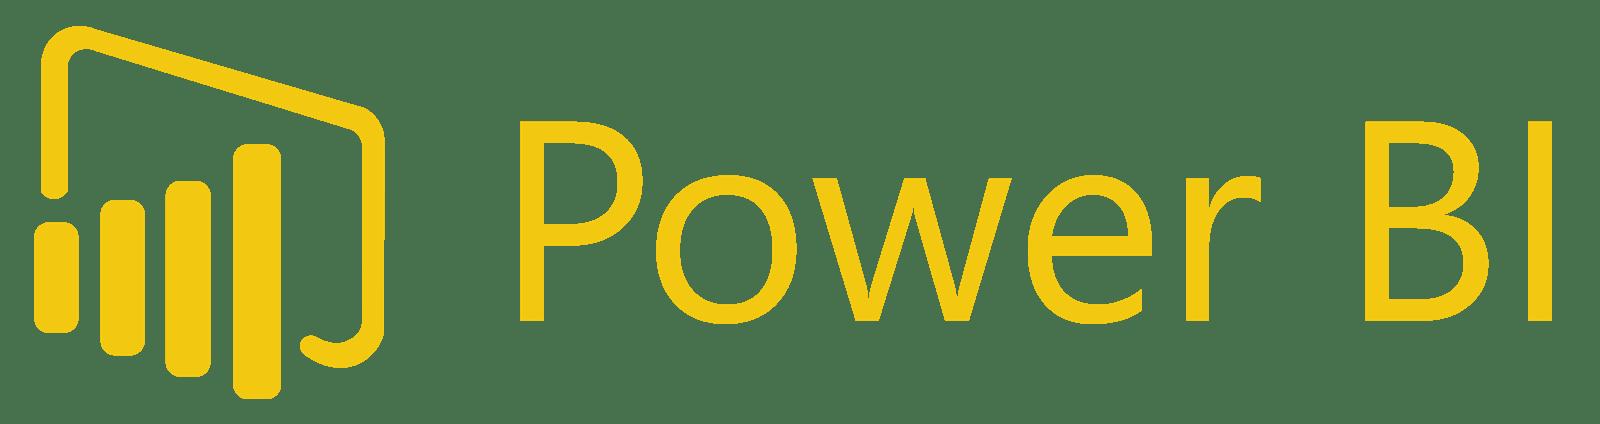 kisspng-power-bi-logo-business-intelligence-font-data-datacarrot-bespoke-development-service-5c5af4c1046a75.9949139515494647690181